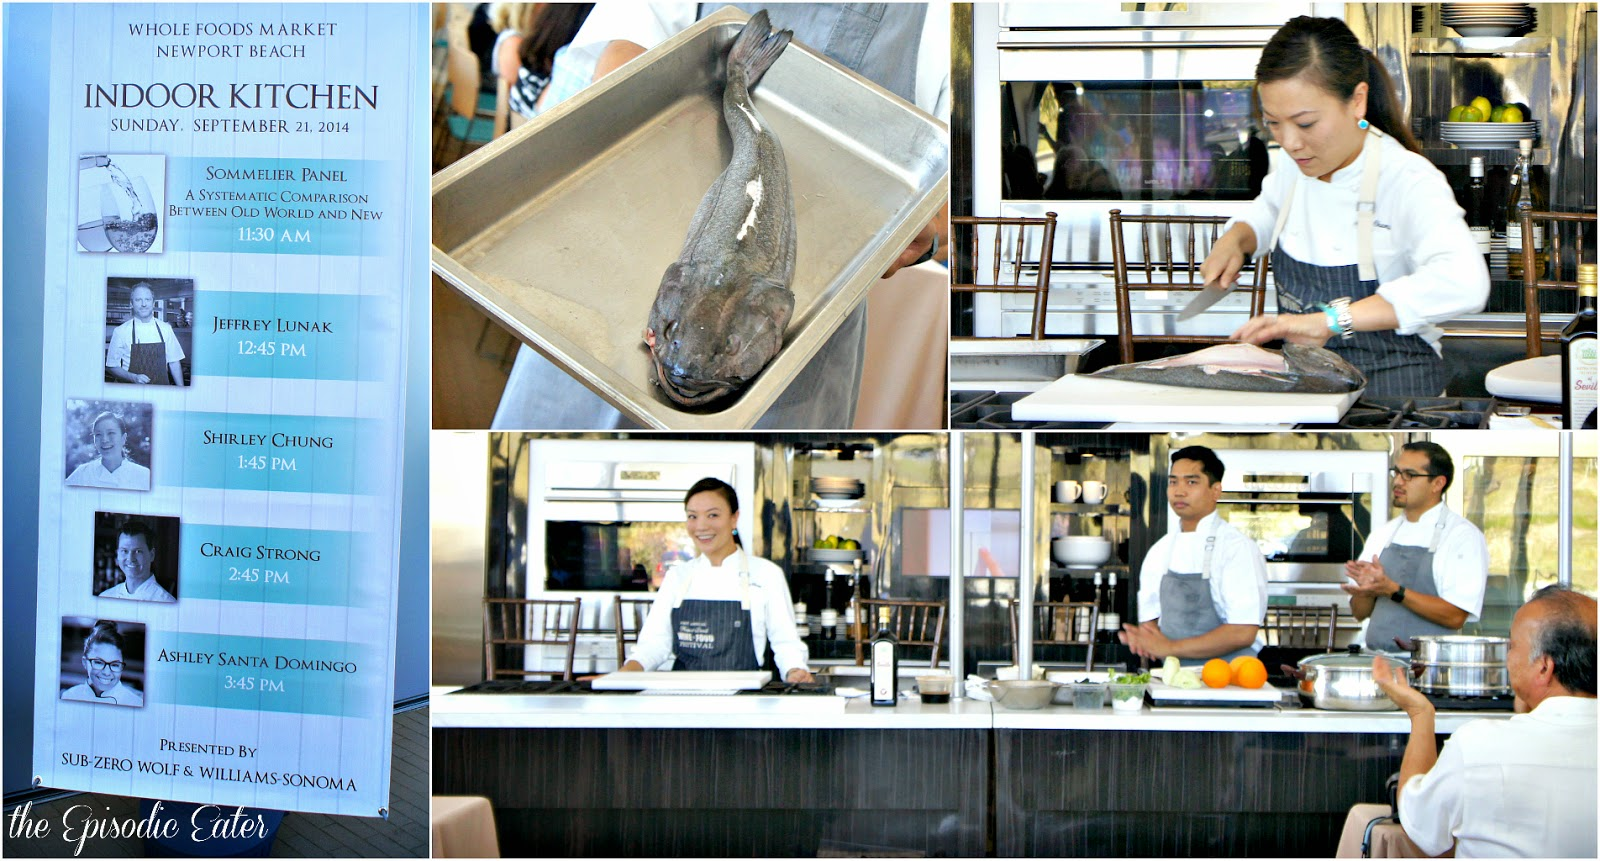 Newport Beach Wine Food Festival (Newport Beach, CA) #2 on The Episodic Eater